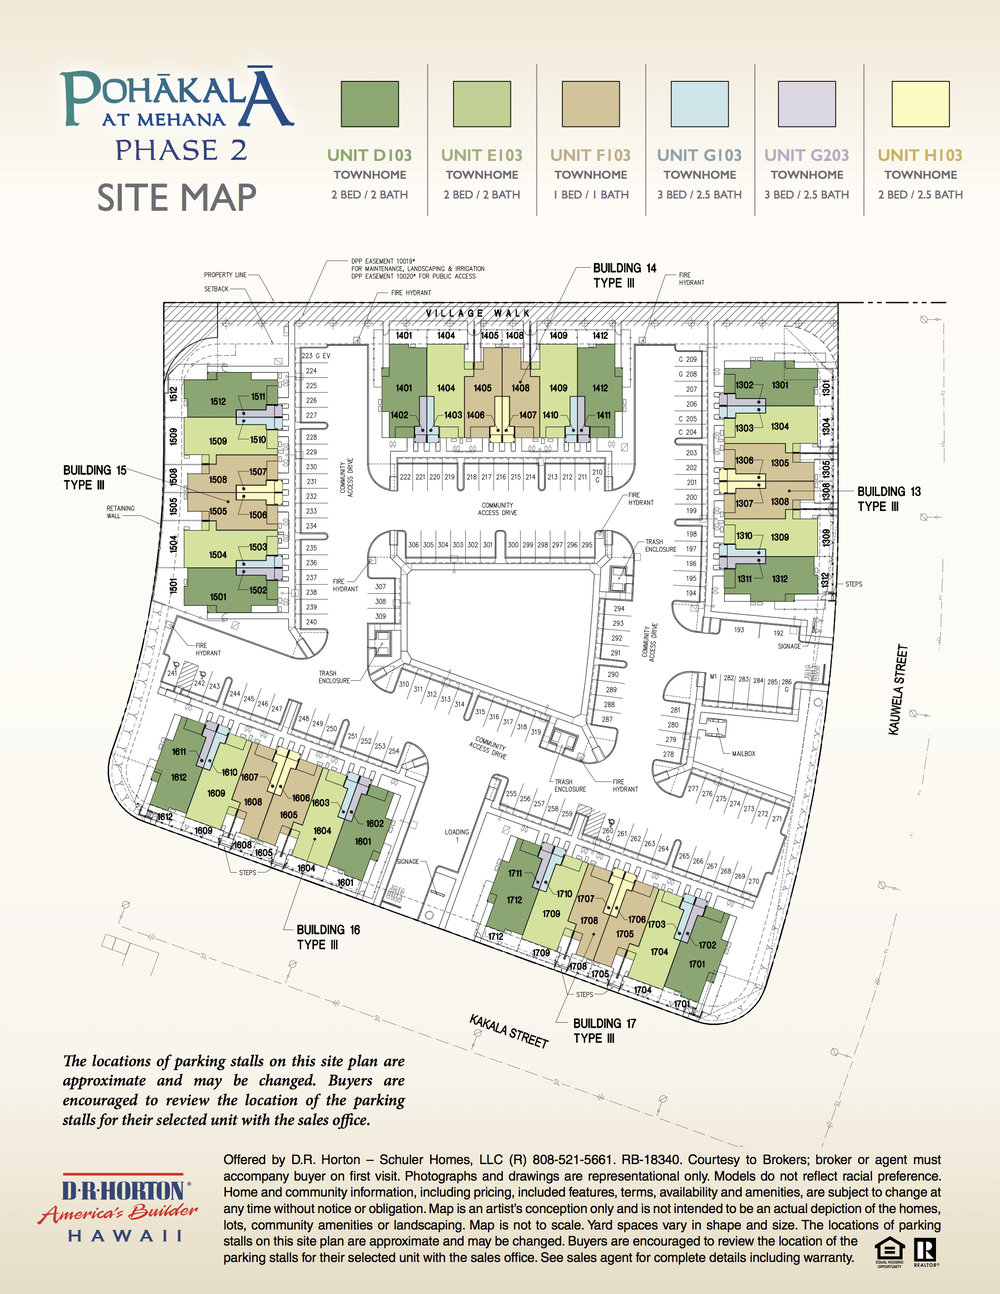 Pohakala Phase 2 Site Map.jpg